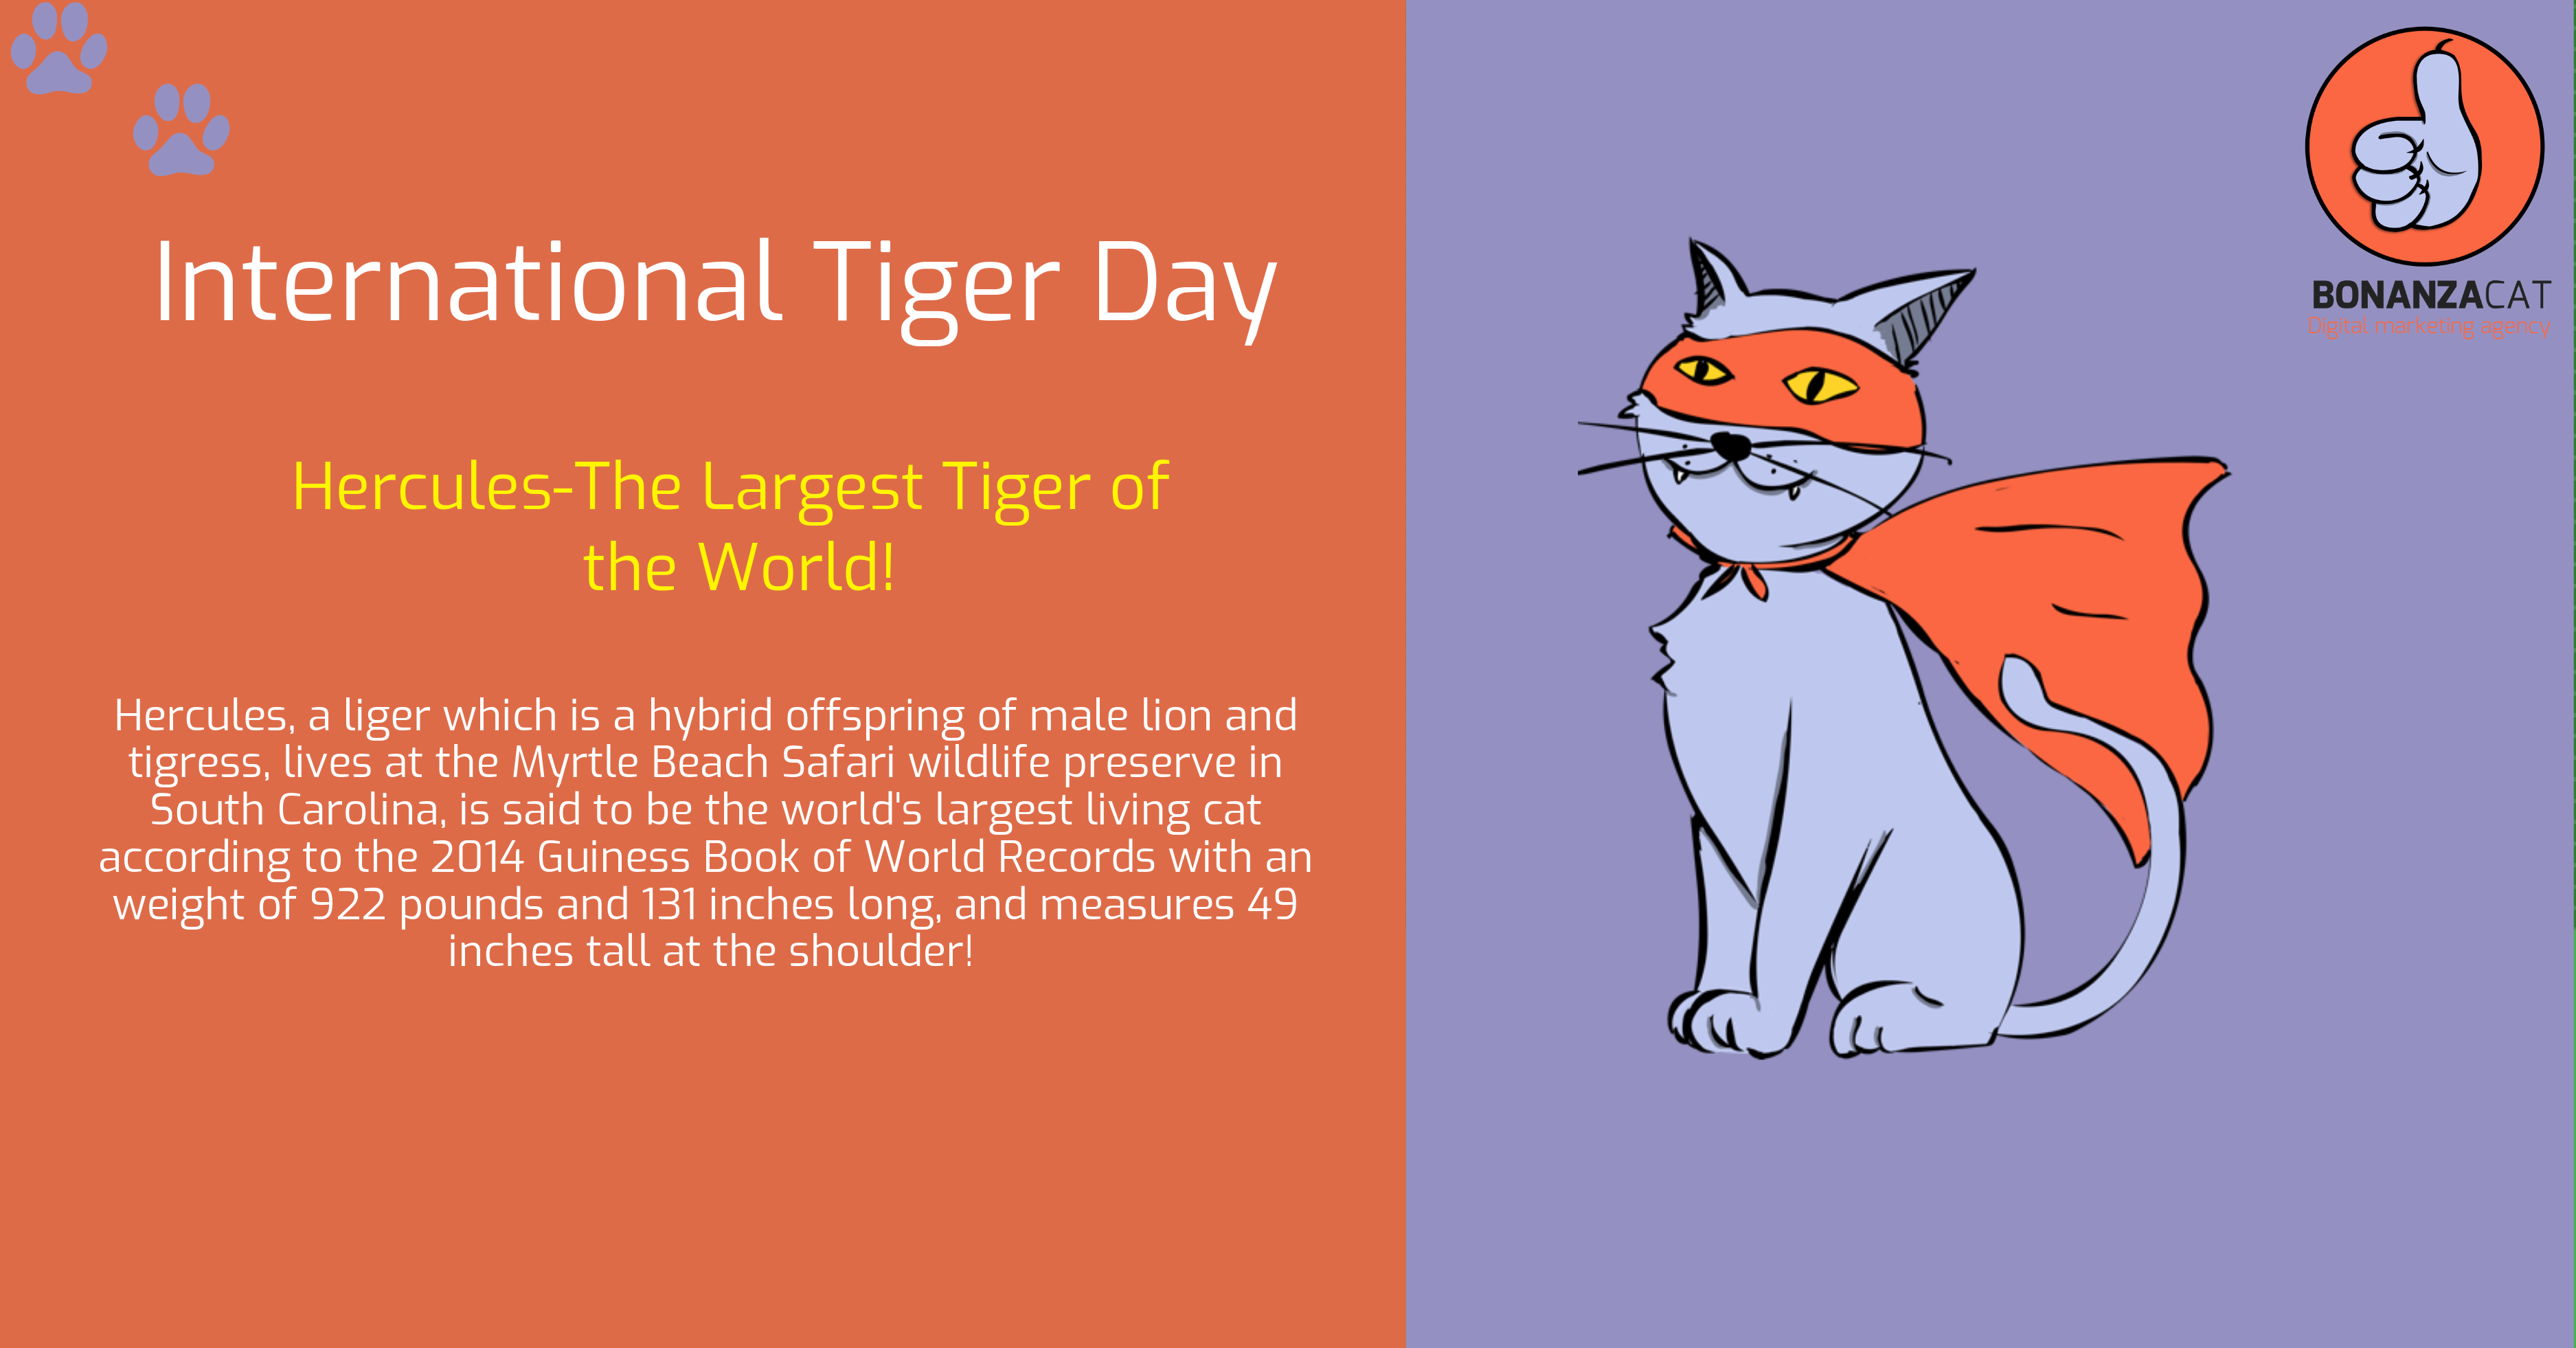 International Tiger Day Digital Marketing Digital Marketing Agency Digital Marketing Solutions